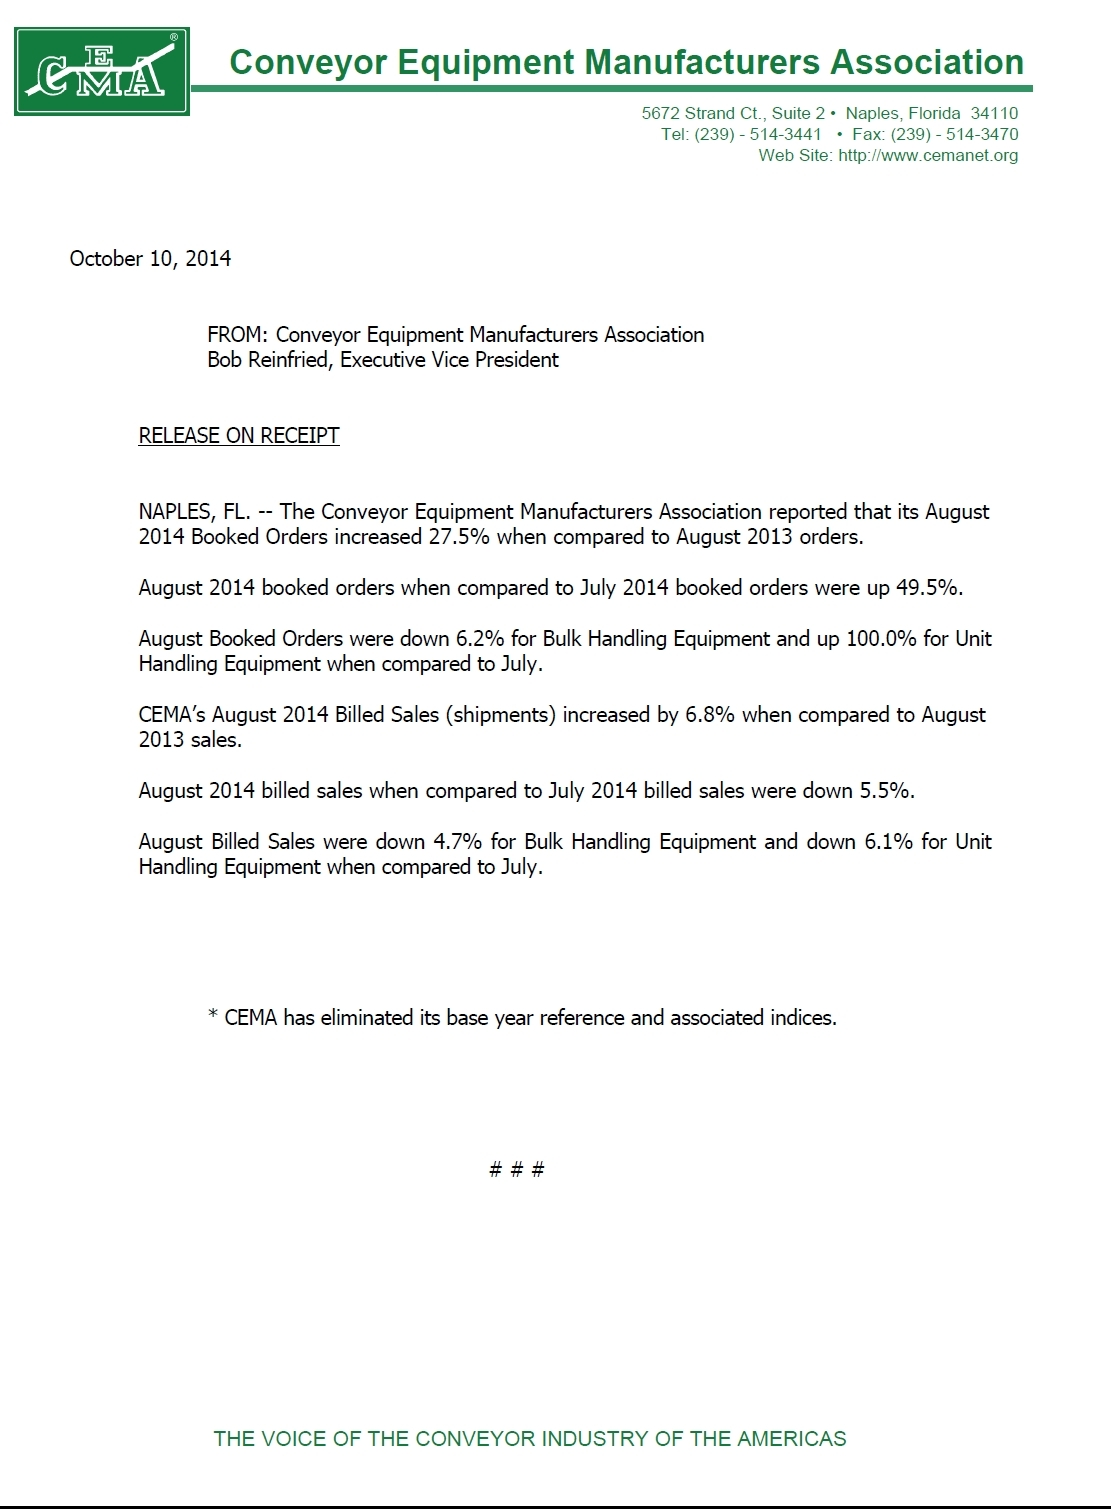 CEMA Statistics Aug 2014